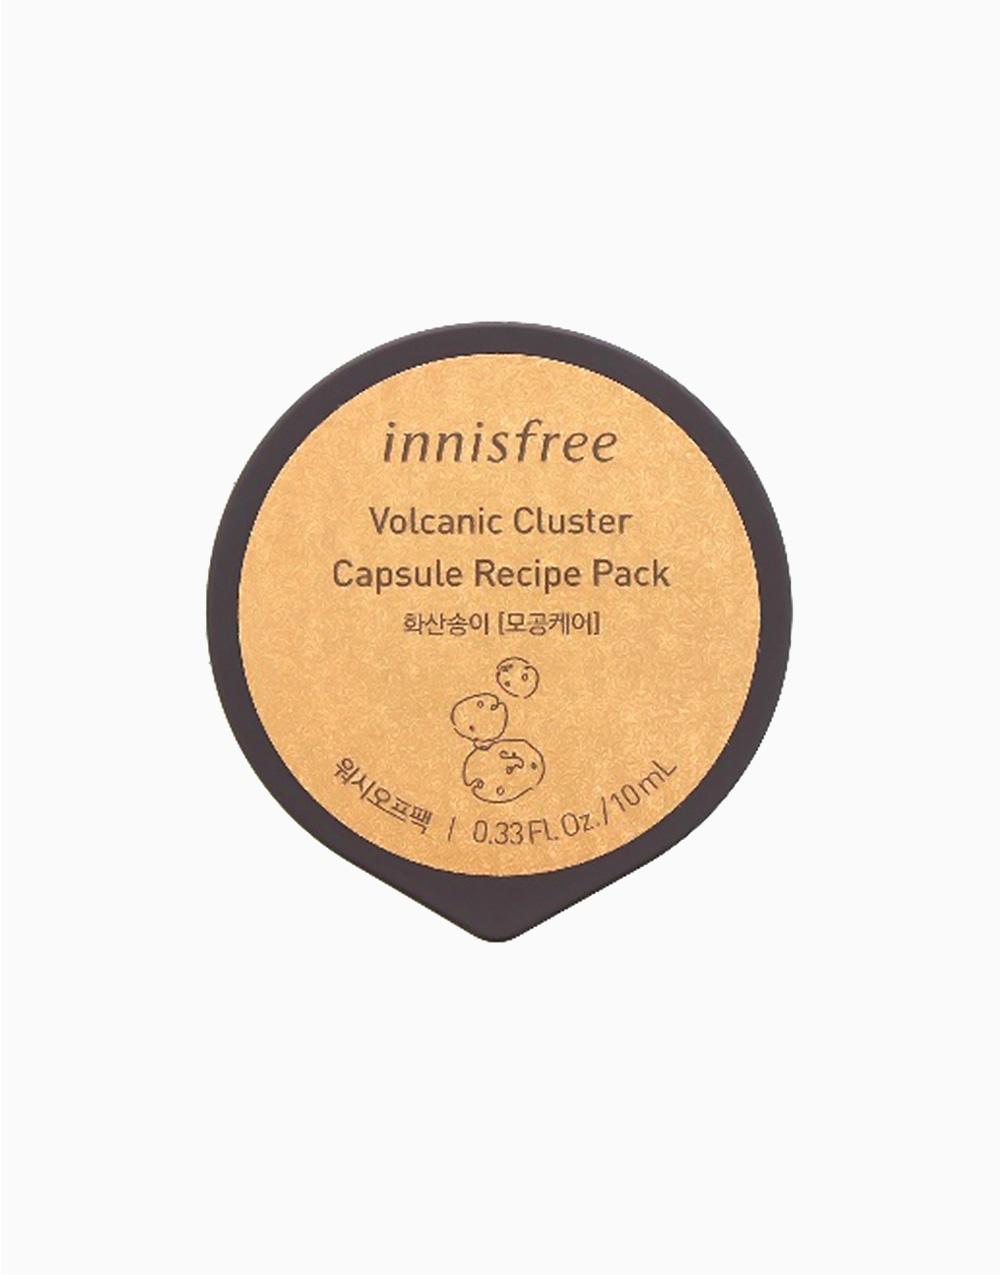 Volcanic Cluster Capsule Recipe Pack by Innisfree